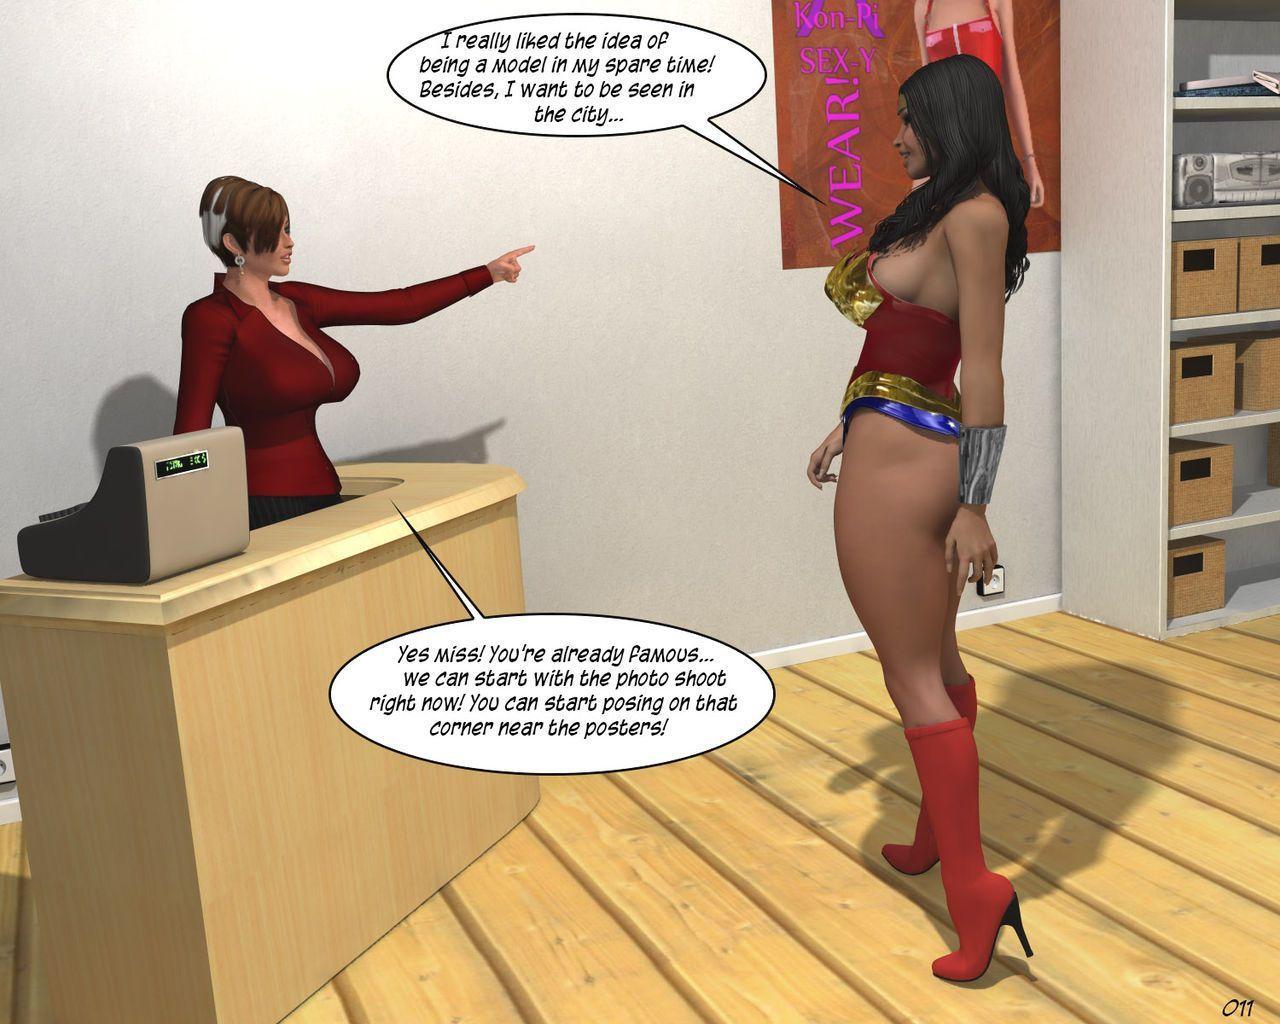 Wonder Woman Adventure - PhotoShrink!